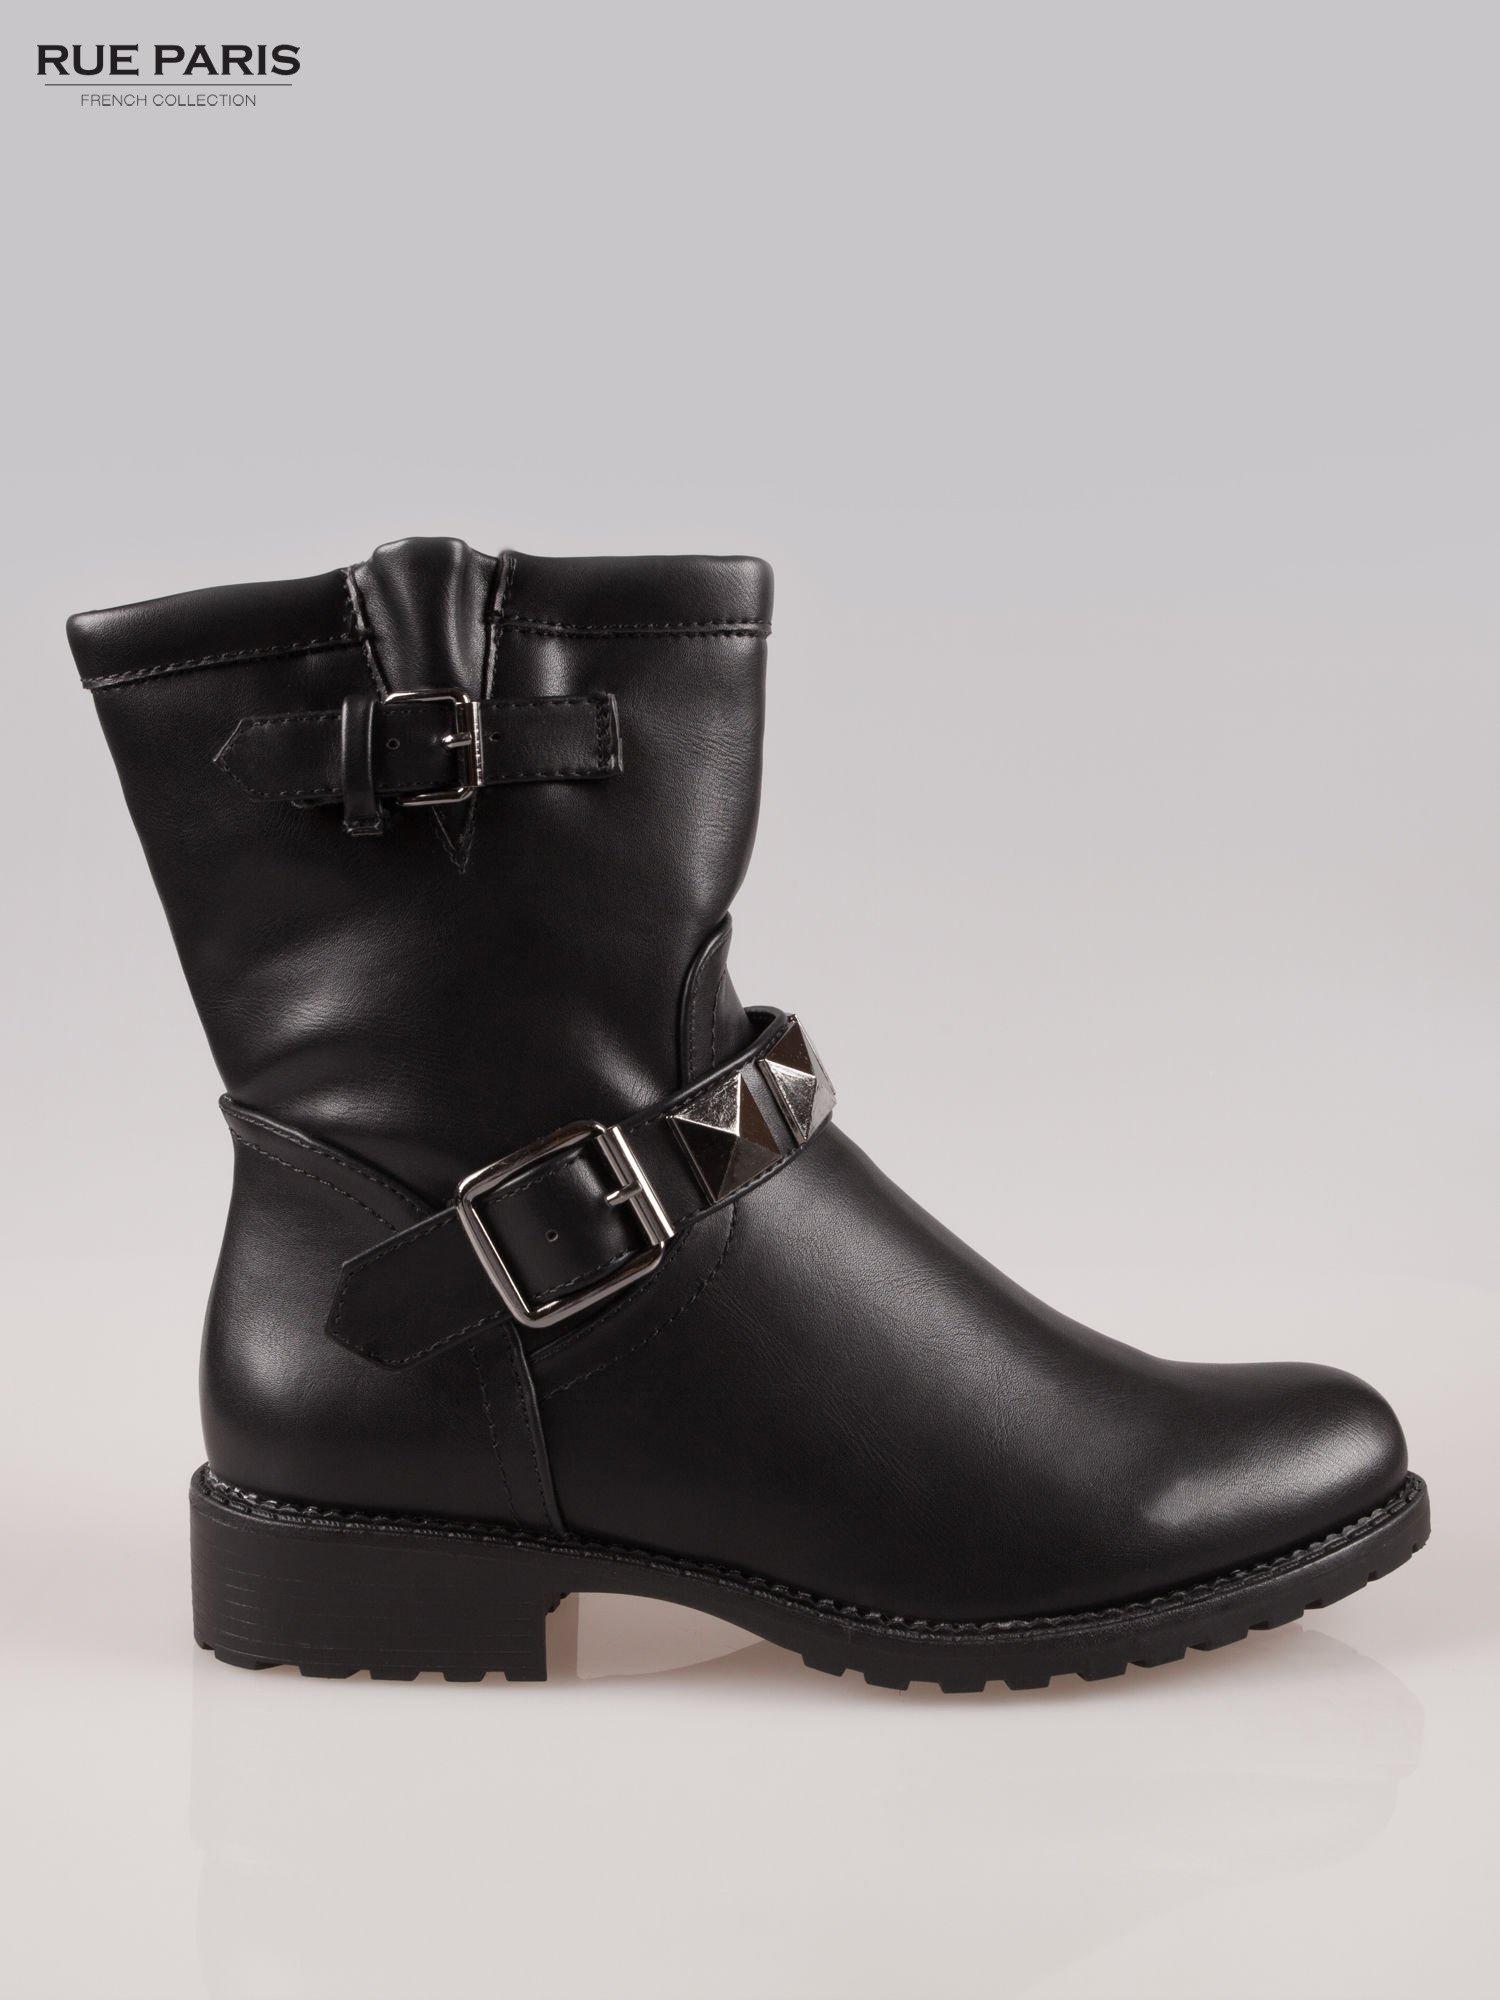 Czarne botki biker boots z klamerkami                                  zdj.                                  1